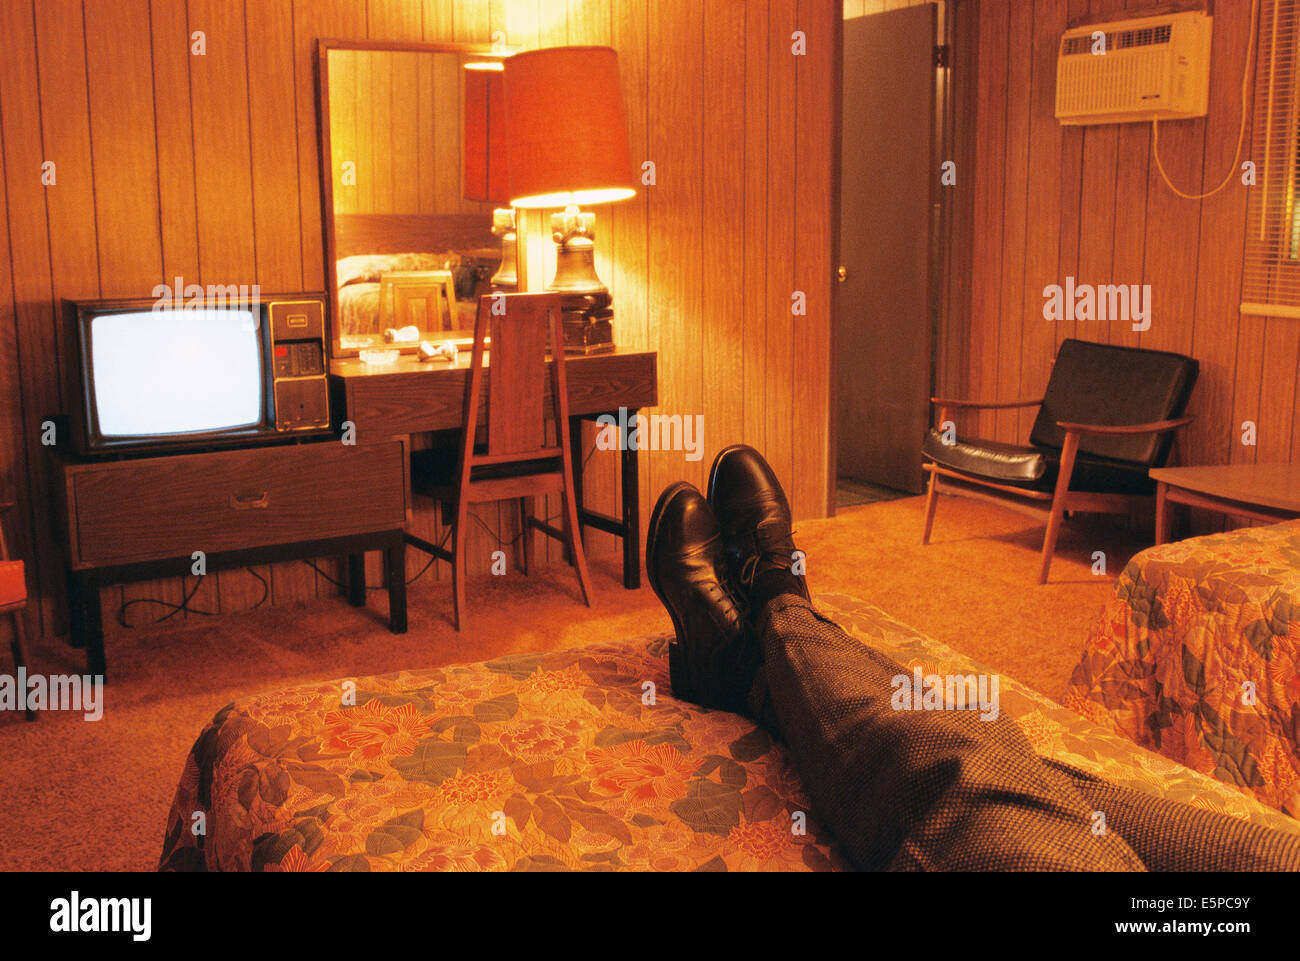 Person vor dem Fernseher in billige Motelzimmer Stockbild